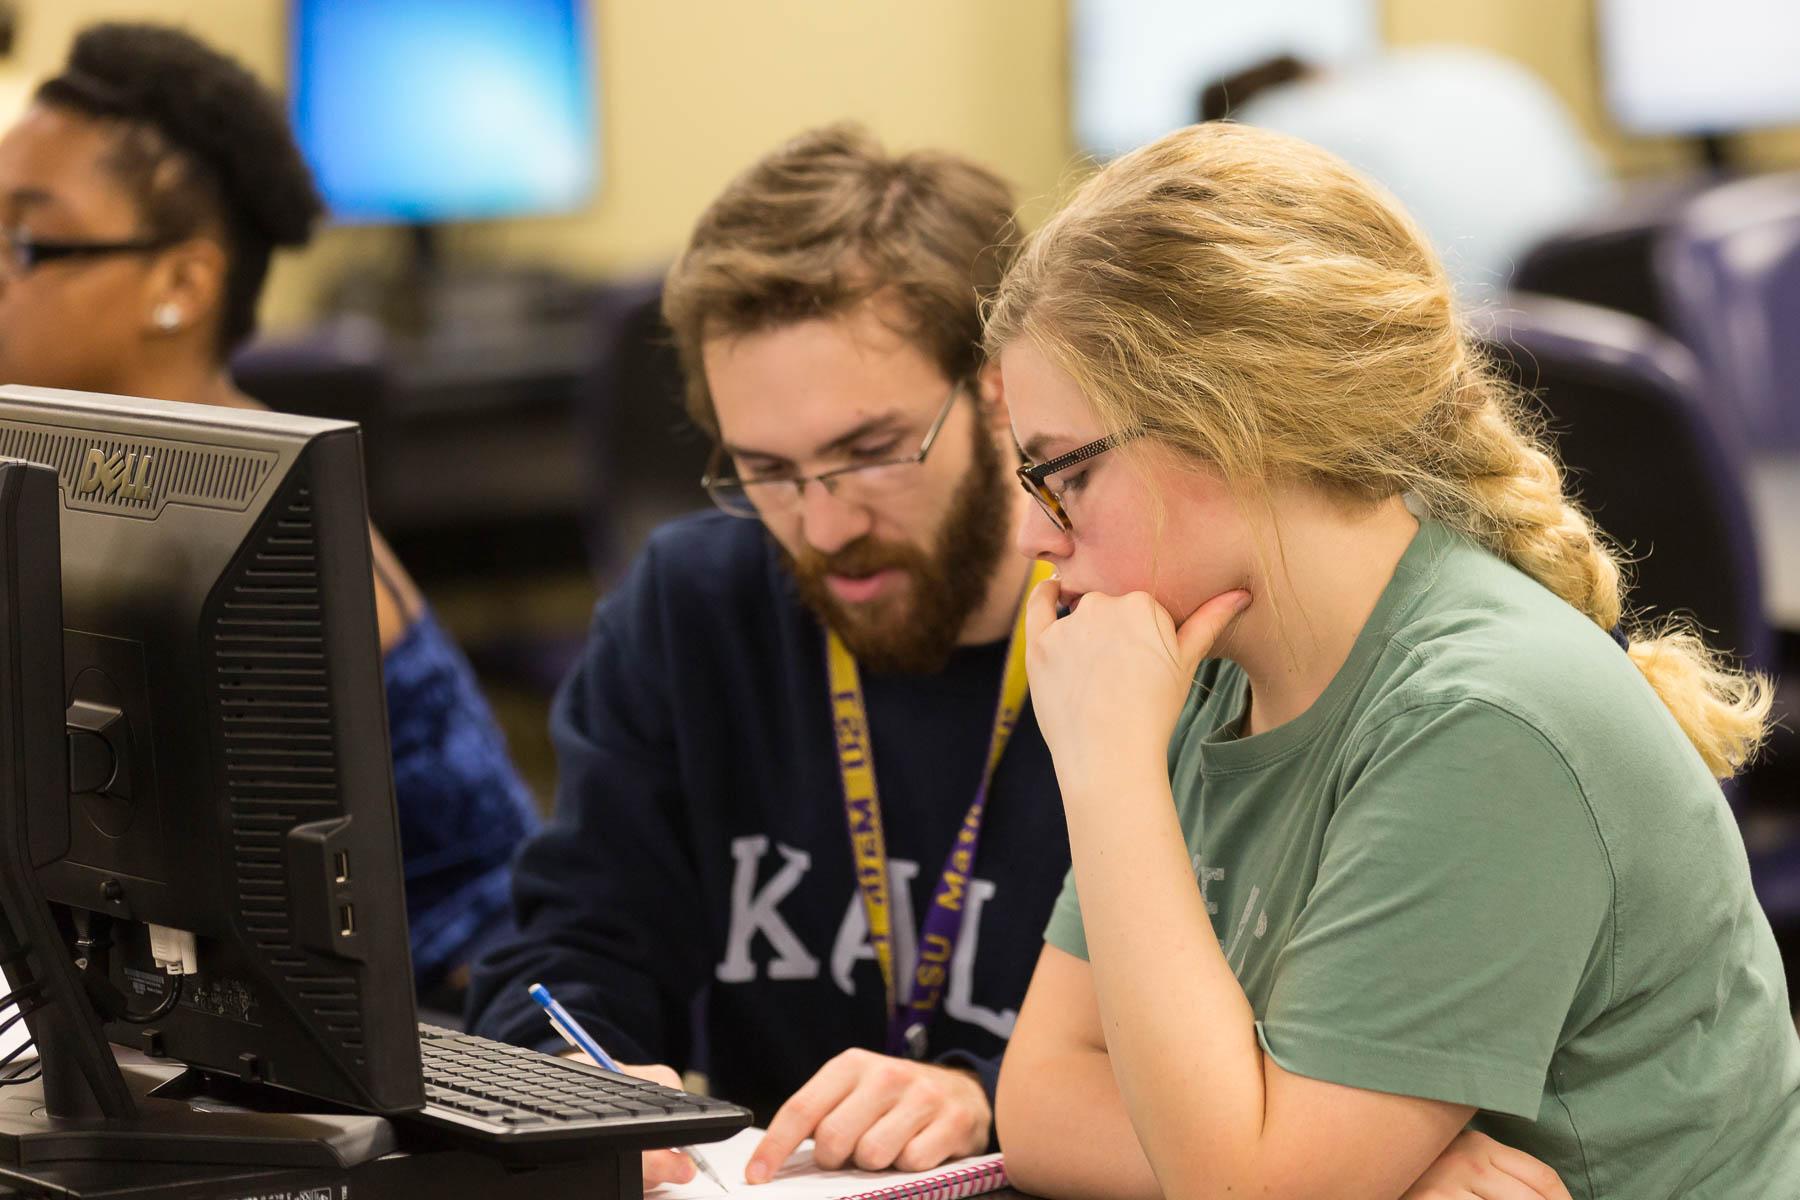 Tutor assisting a student in LSU Math Lab